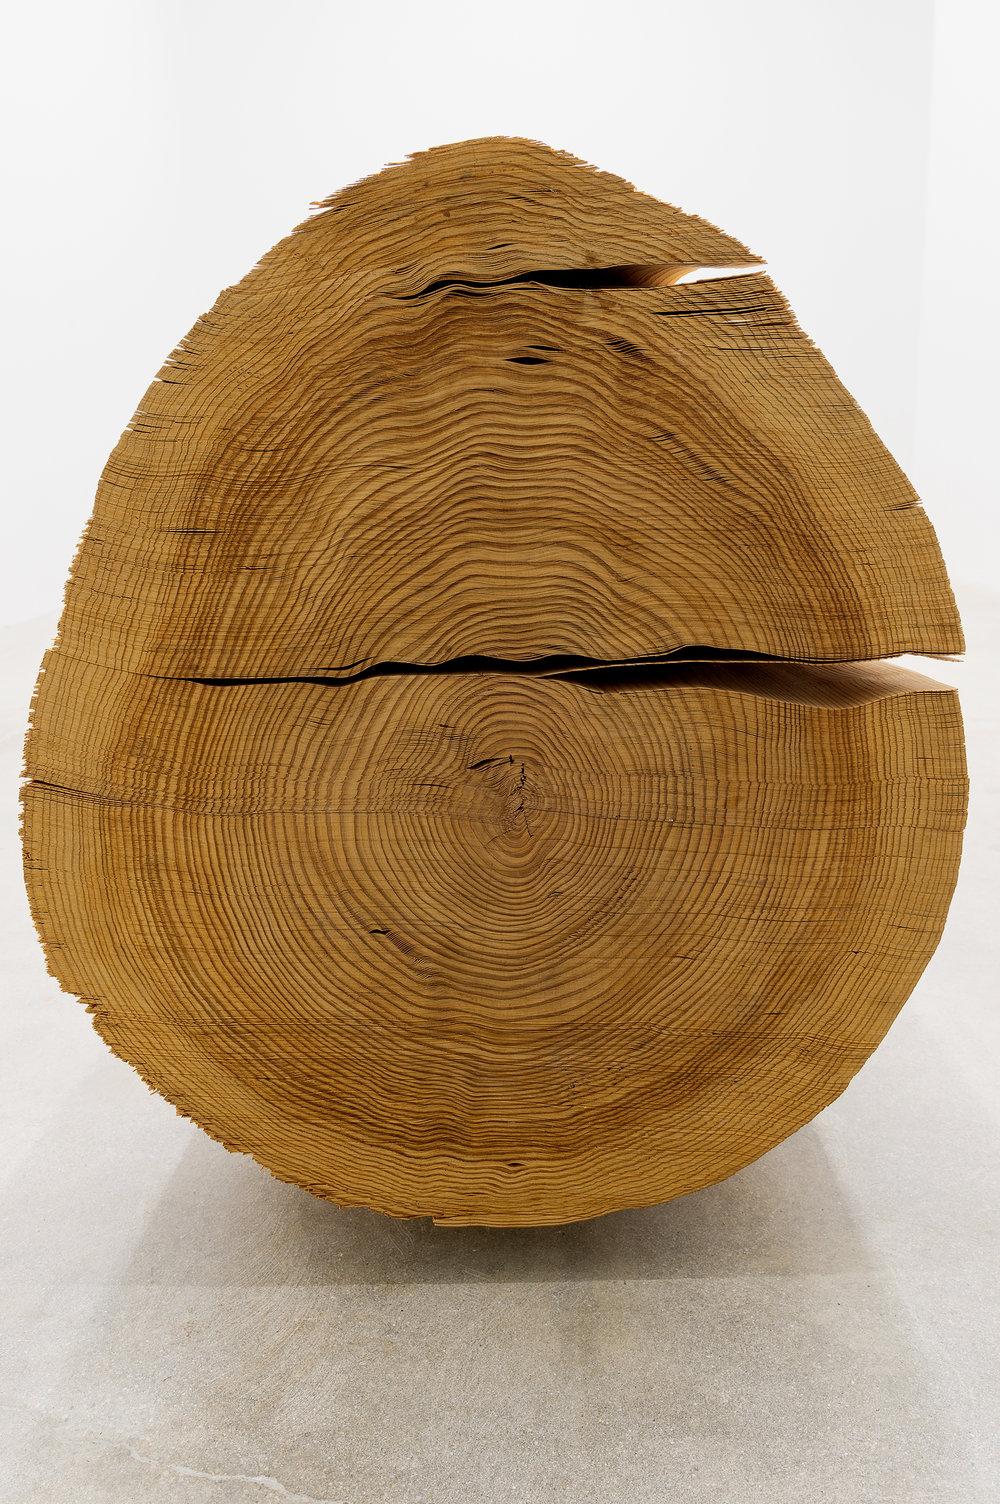 Wood No. 5-CI, 1984